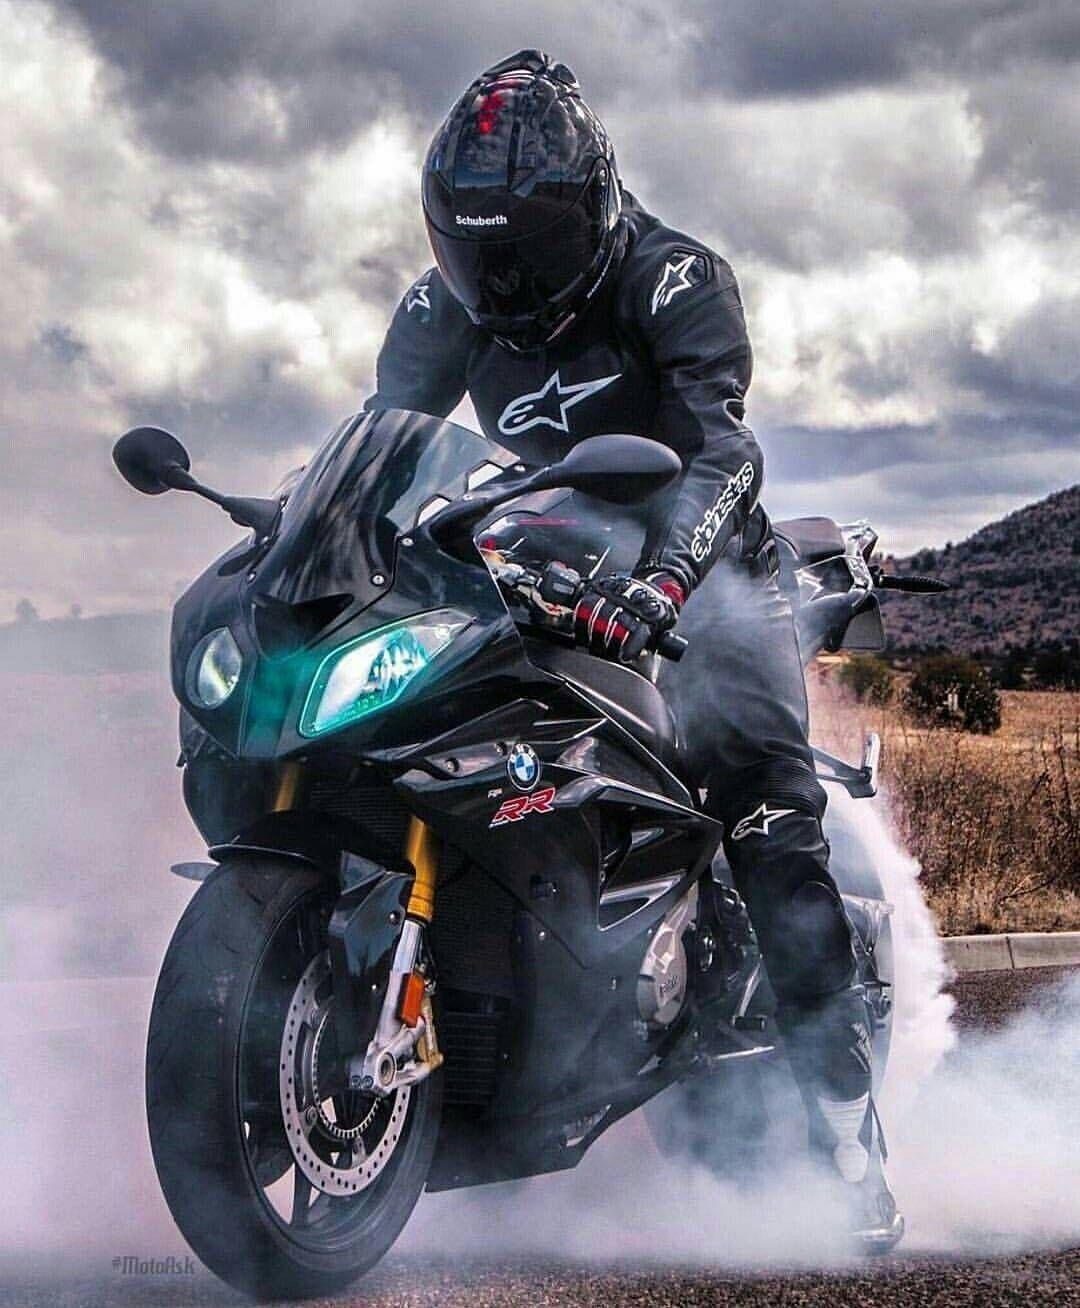 Motoron Motorin Motocycle Yamaha Honda Kawasaki In 2020 Sports Bikes Motorcycles Sport Bikes Motorcycle